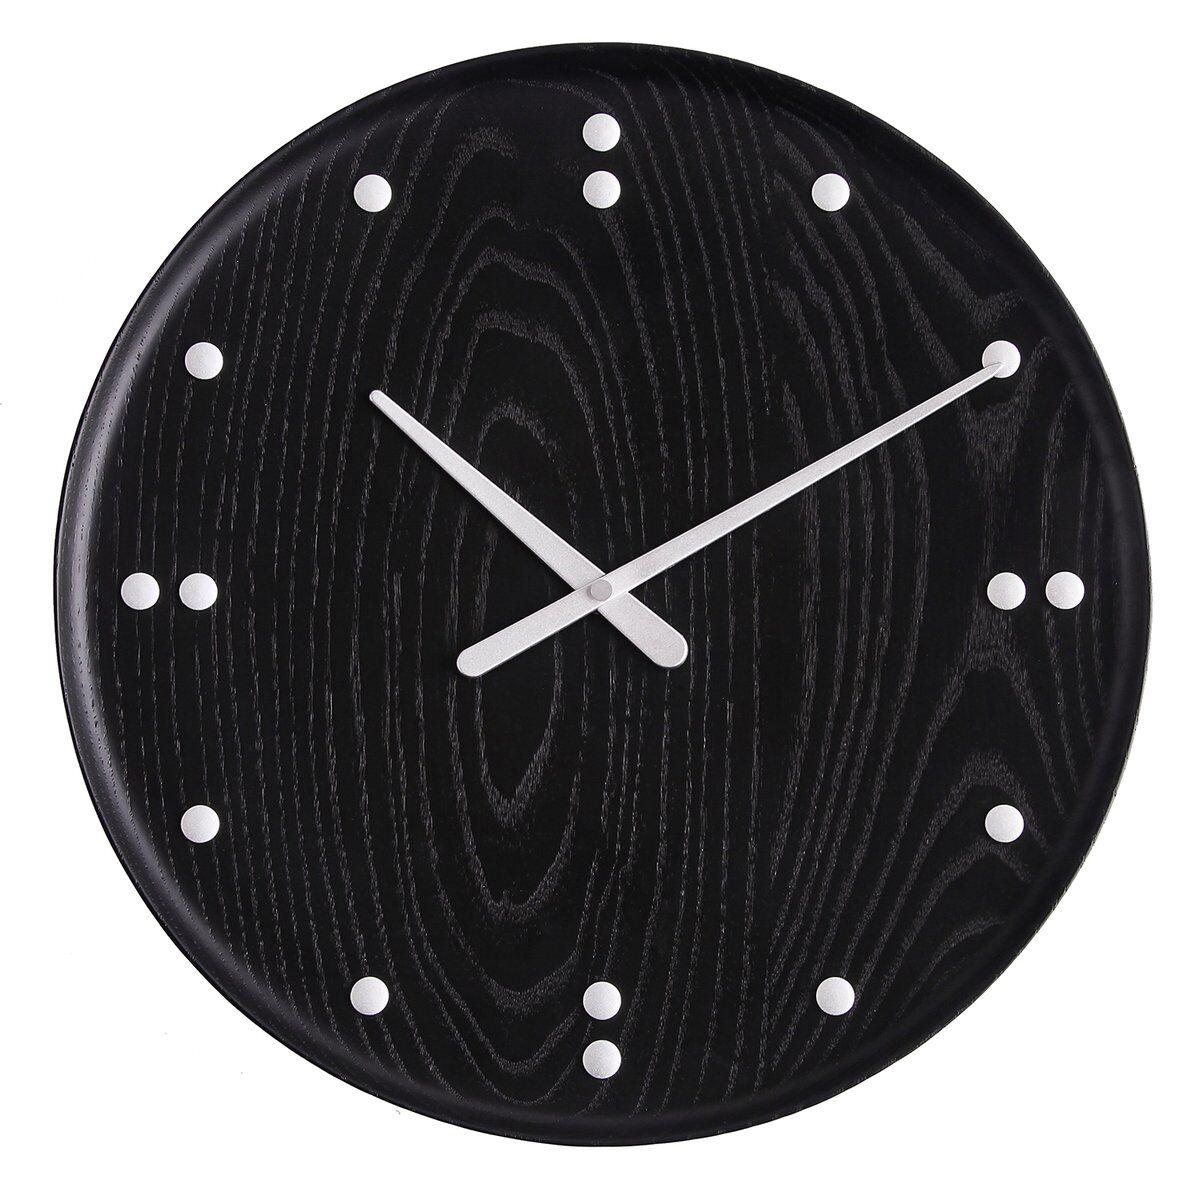 Architectmade FJ Clock seinäkello 35 cm, musta